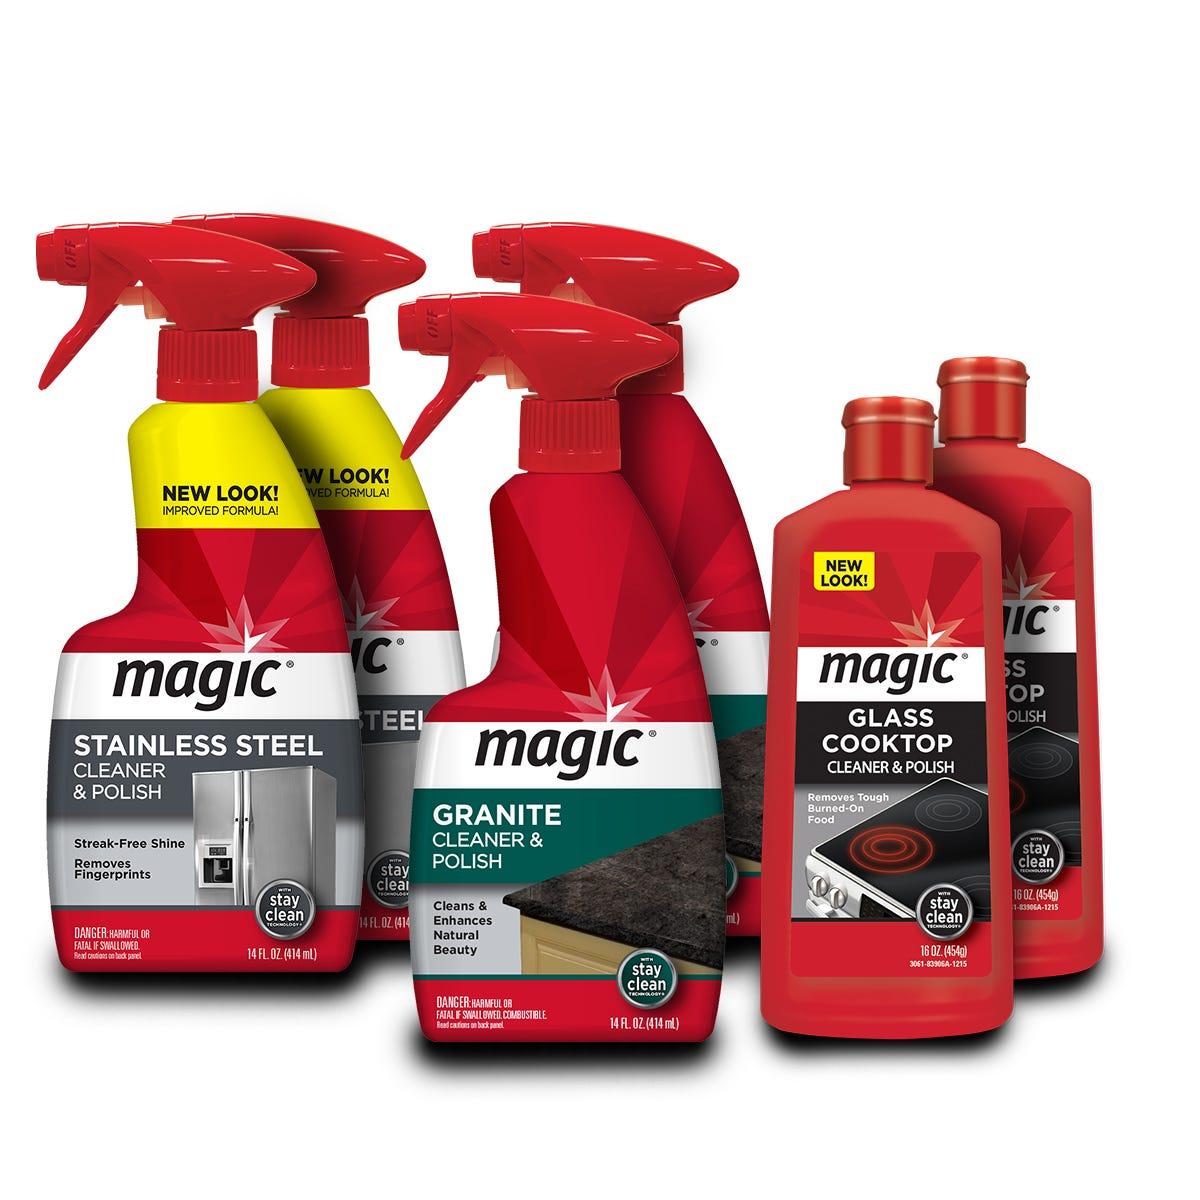 https://googone.com/media/catalog/product/m/a/magic_spectacular_kitchen_pack_1.jpg